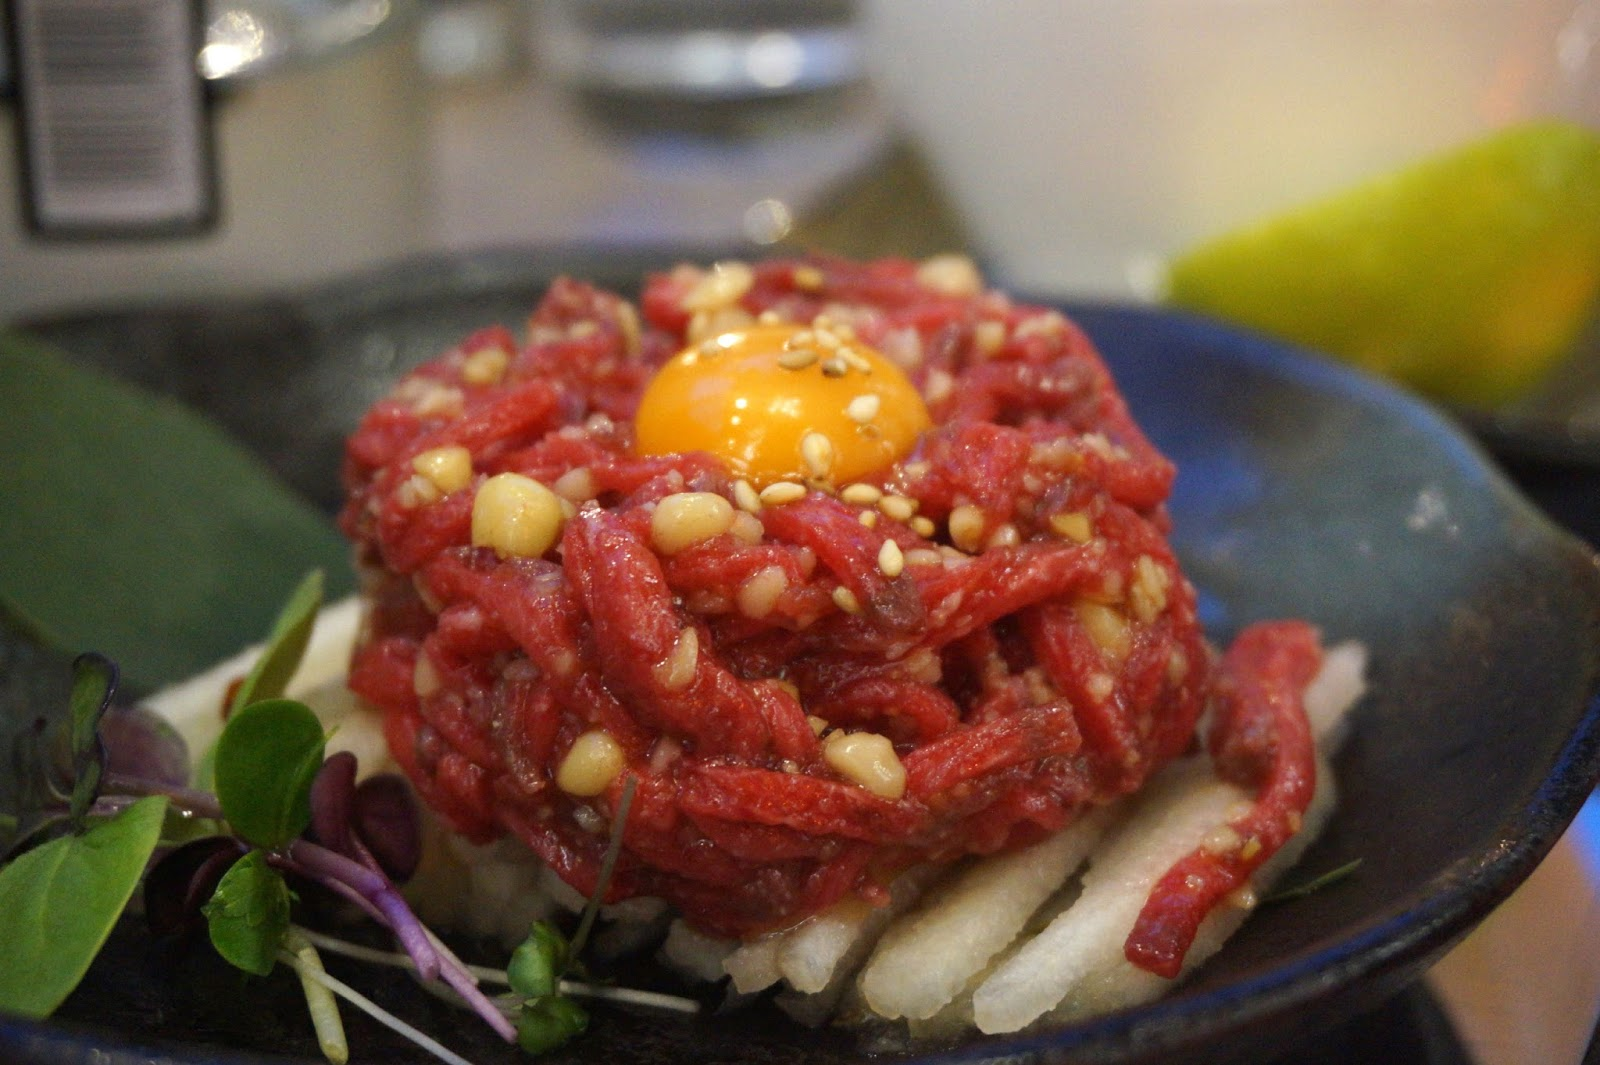 beef tartare with raw egg yolk